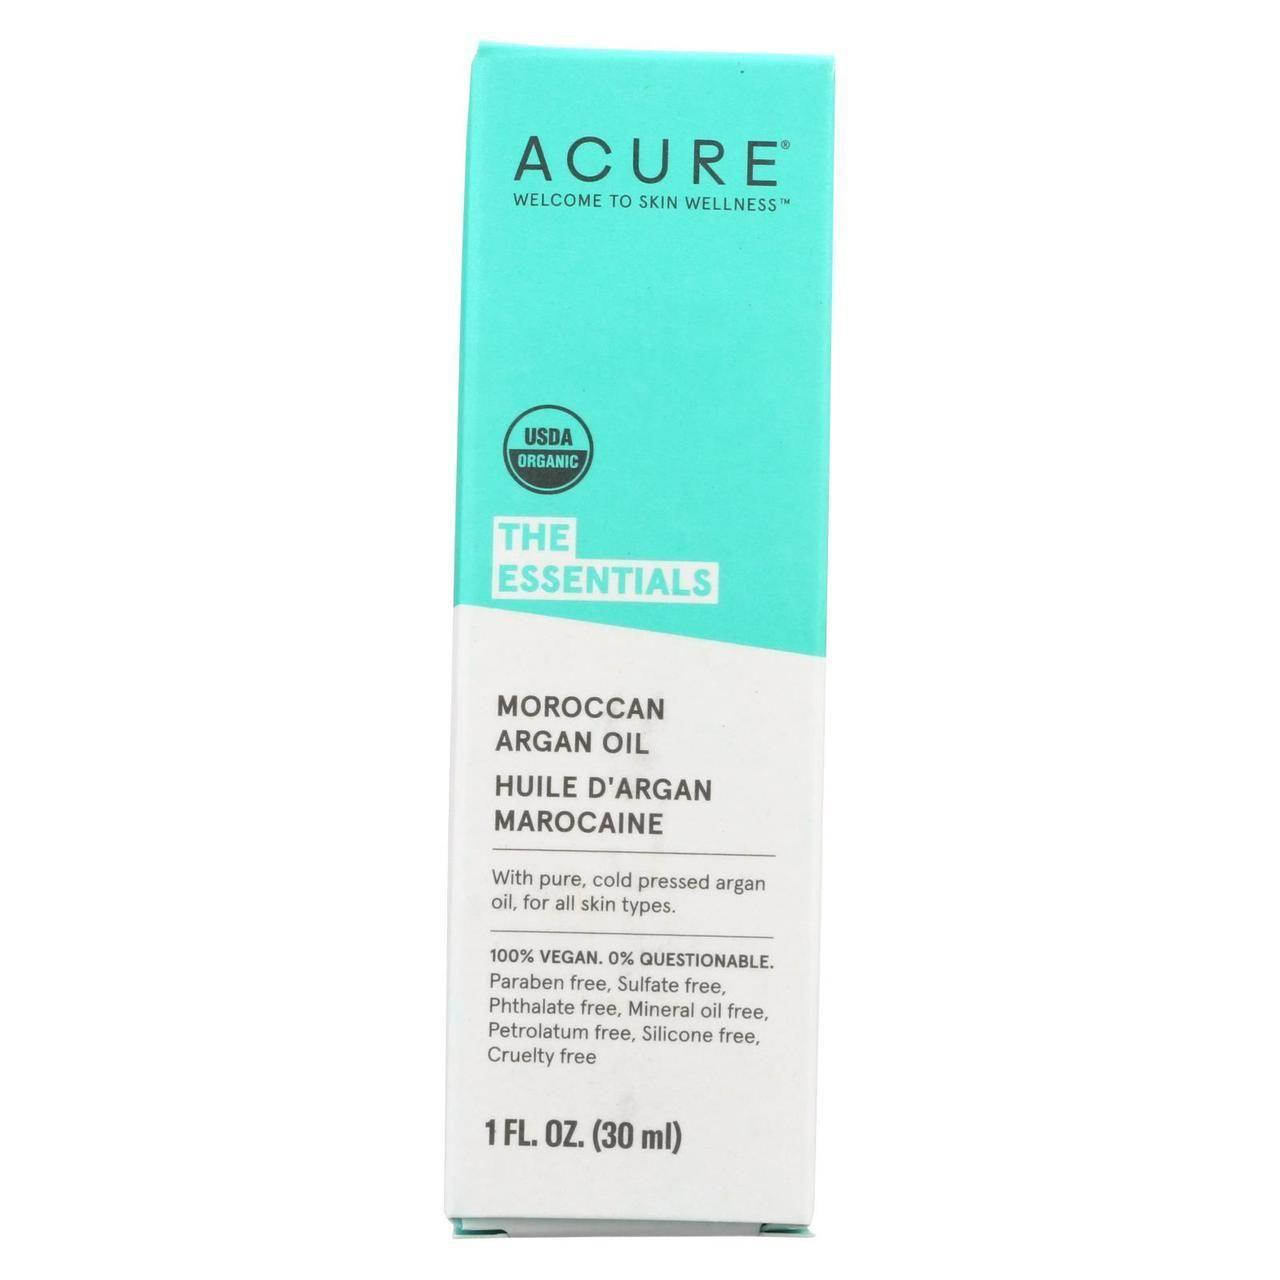 Acure, Moroccan Argan Oil, Oils